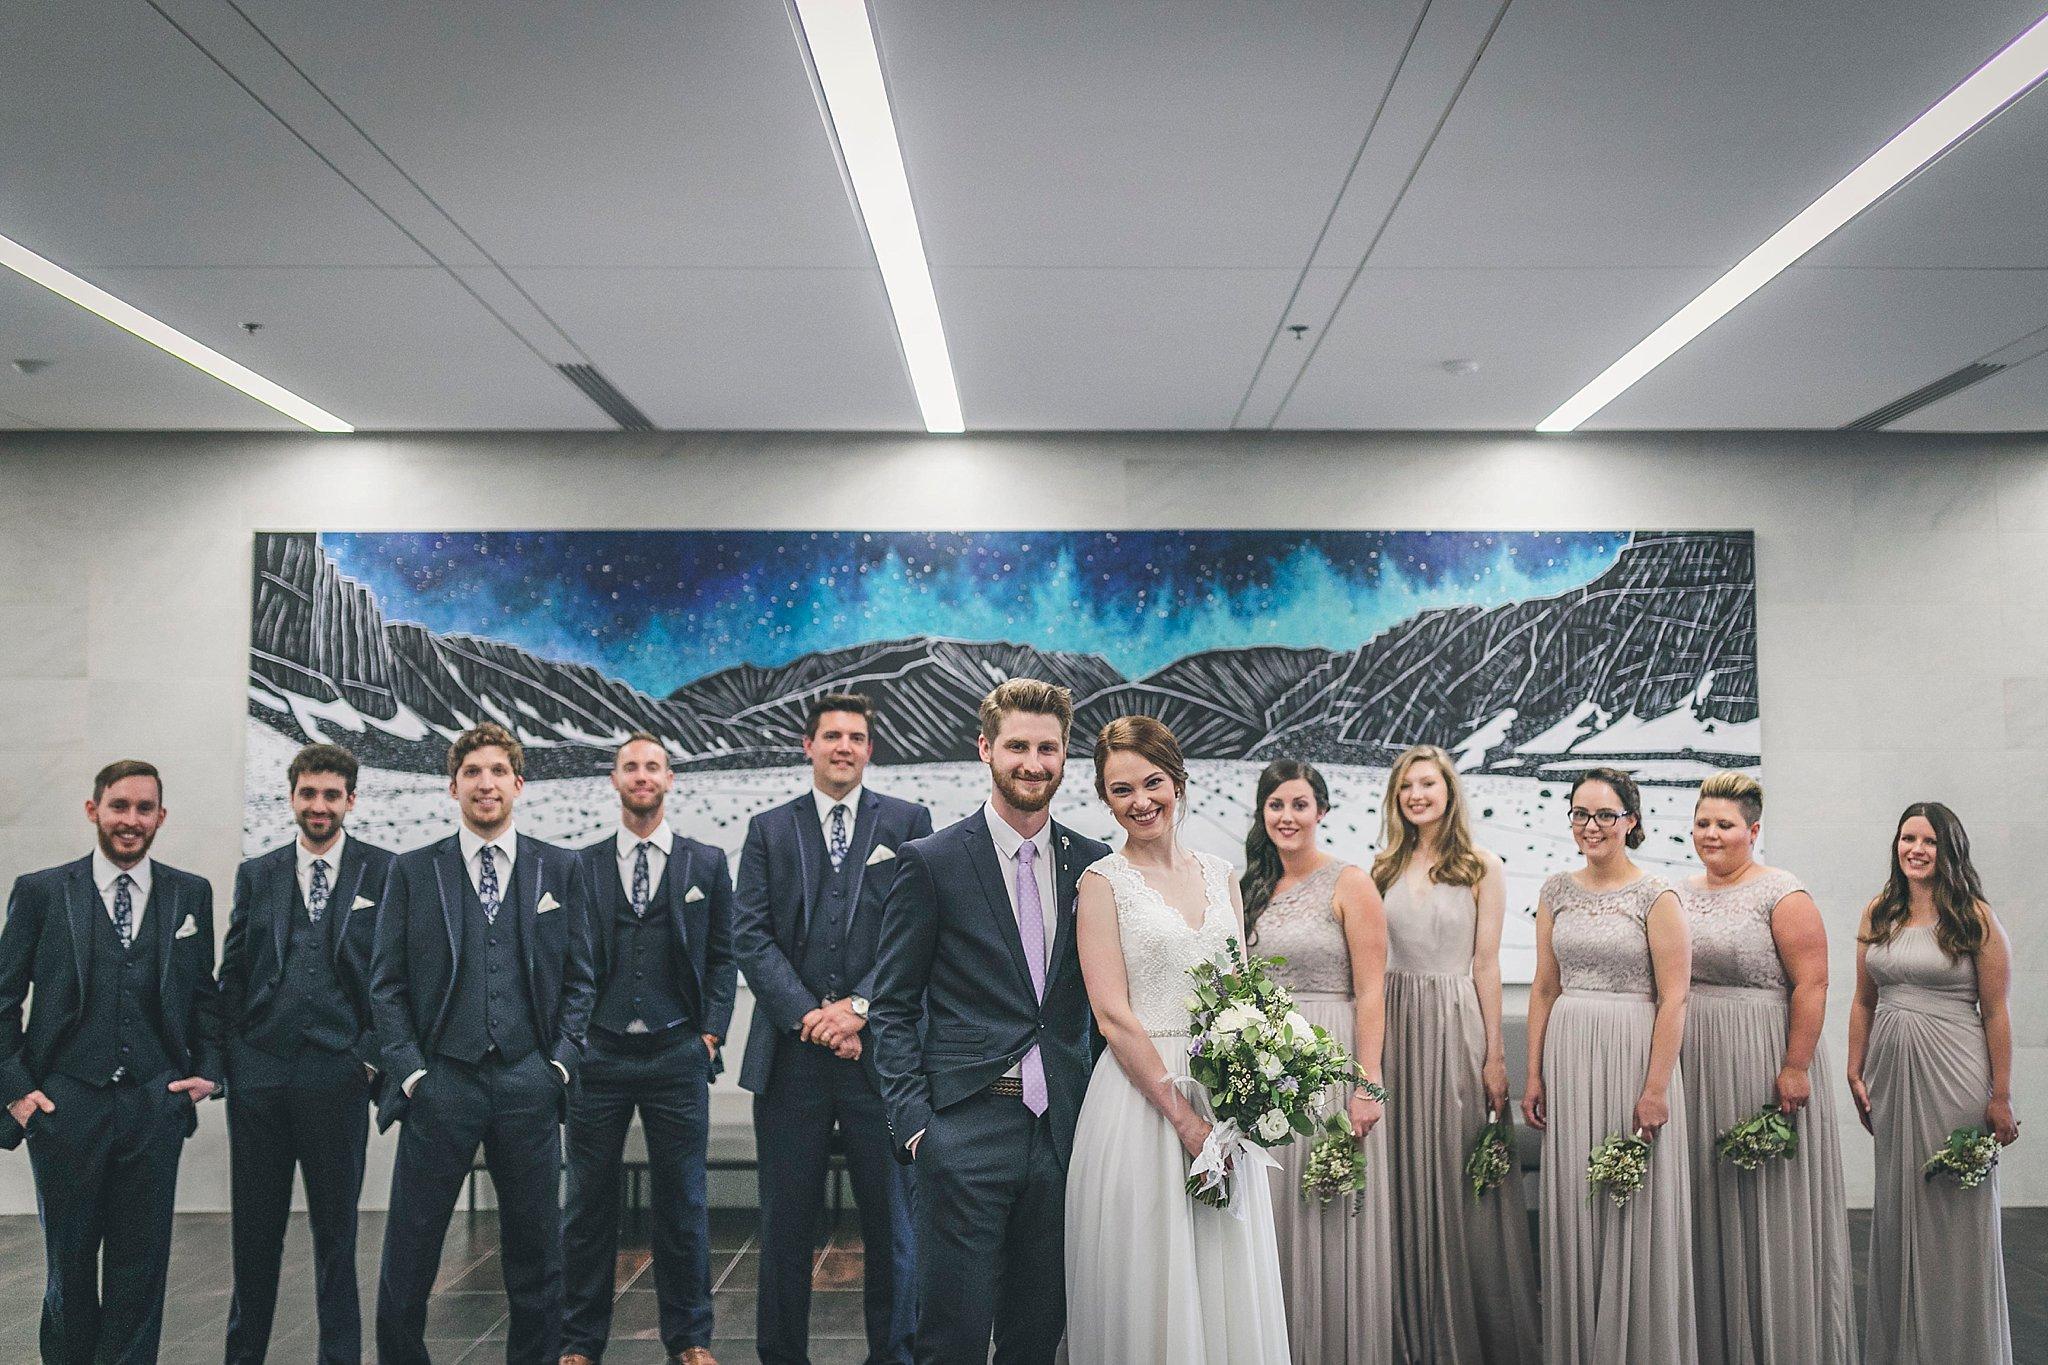 Wedding party  photos by St. John's Wedding Photographer JP Mullowney